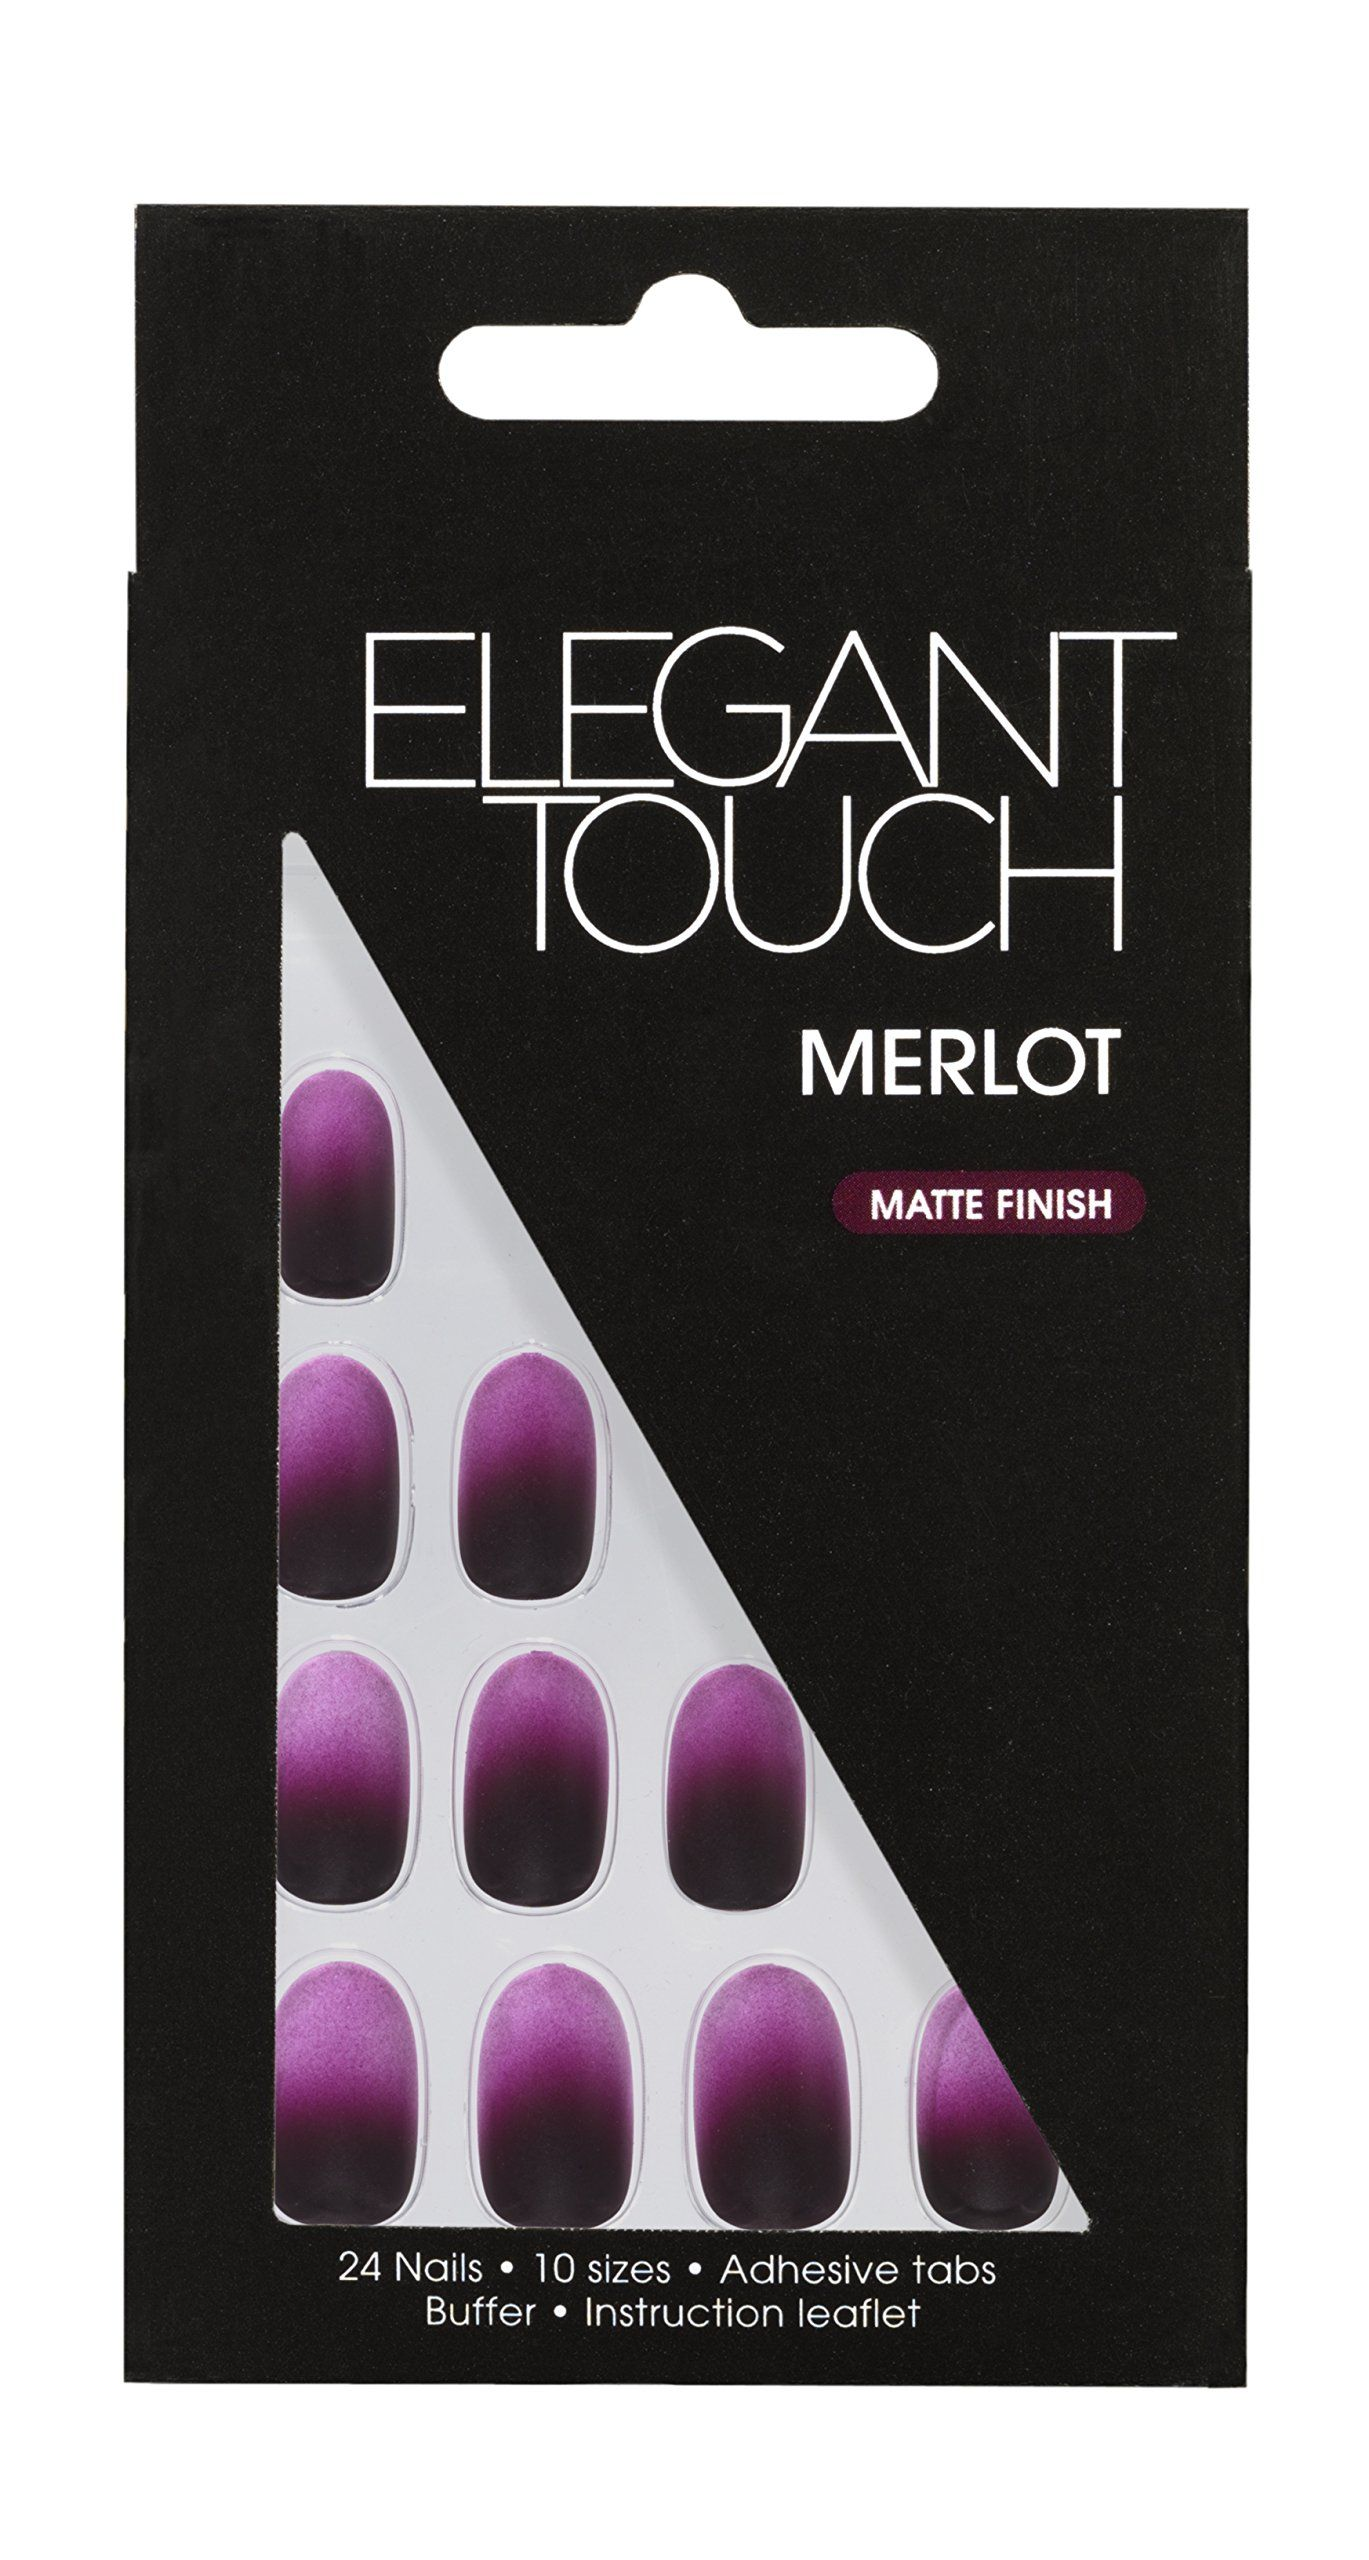 Elegant Touch Trend Ombre, Merlot | N A I L S | Pinterest